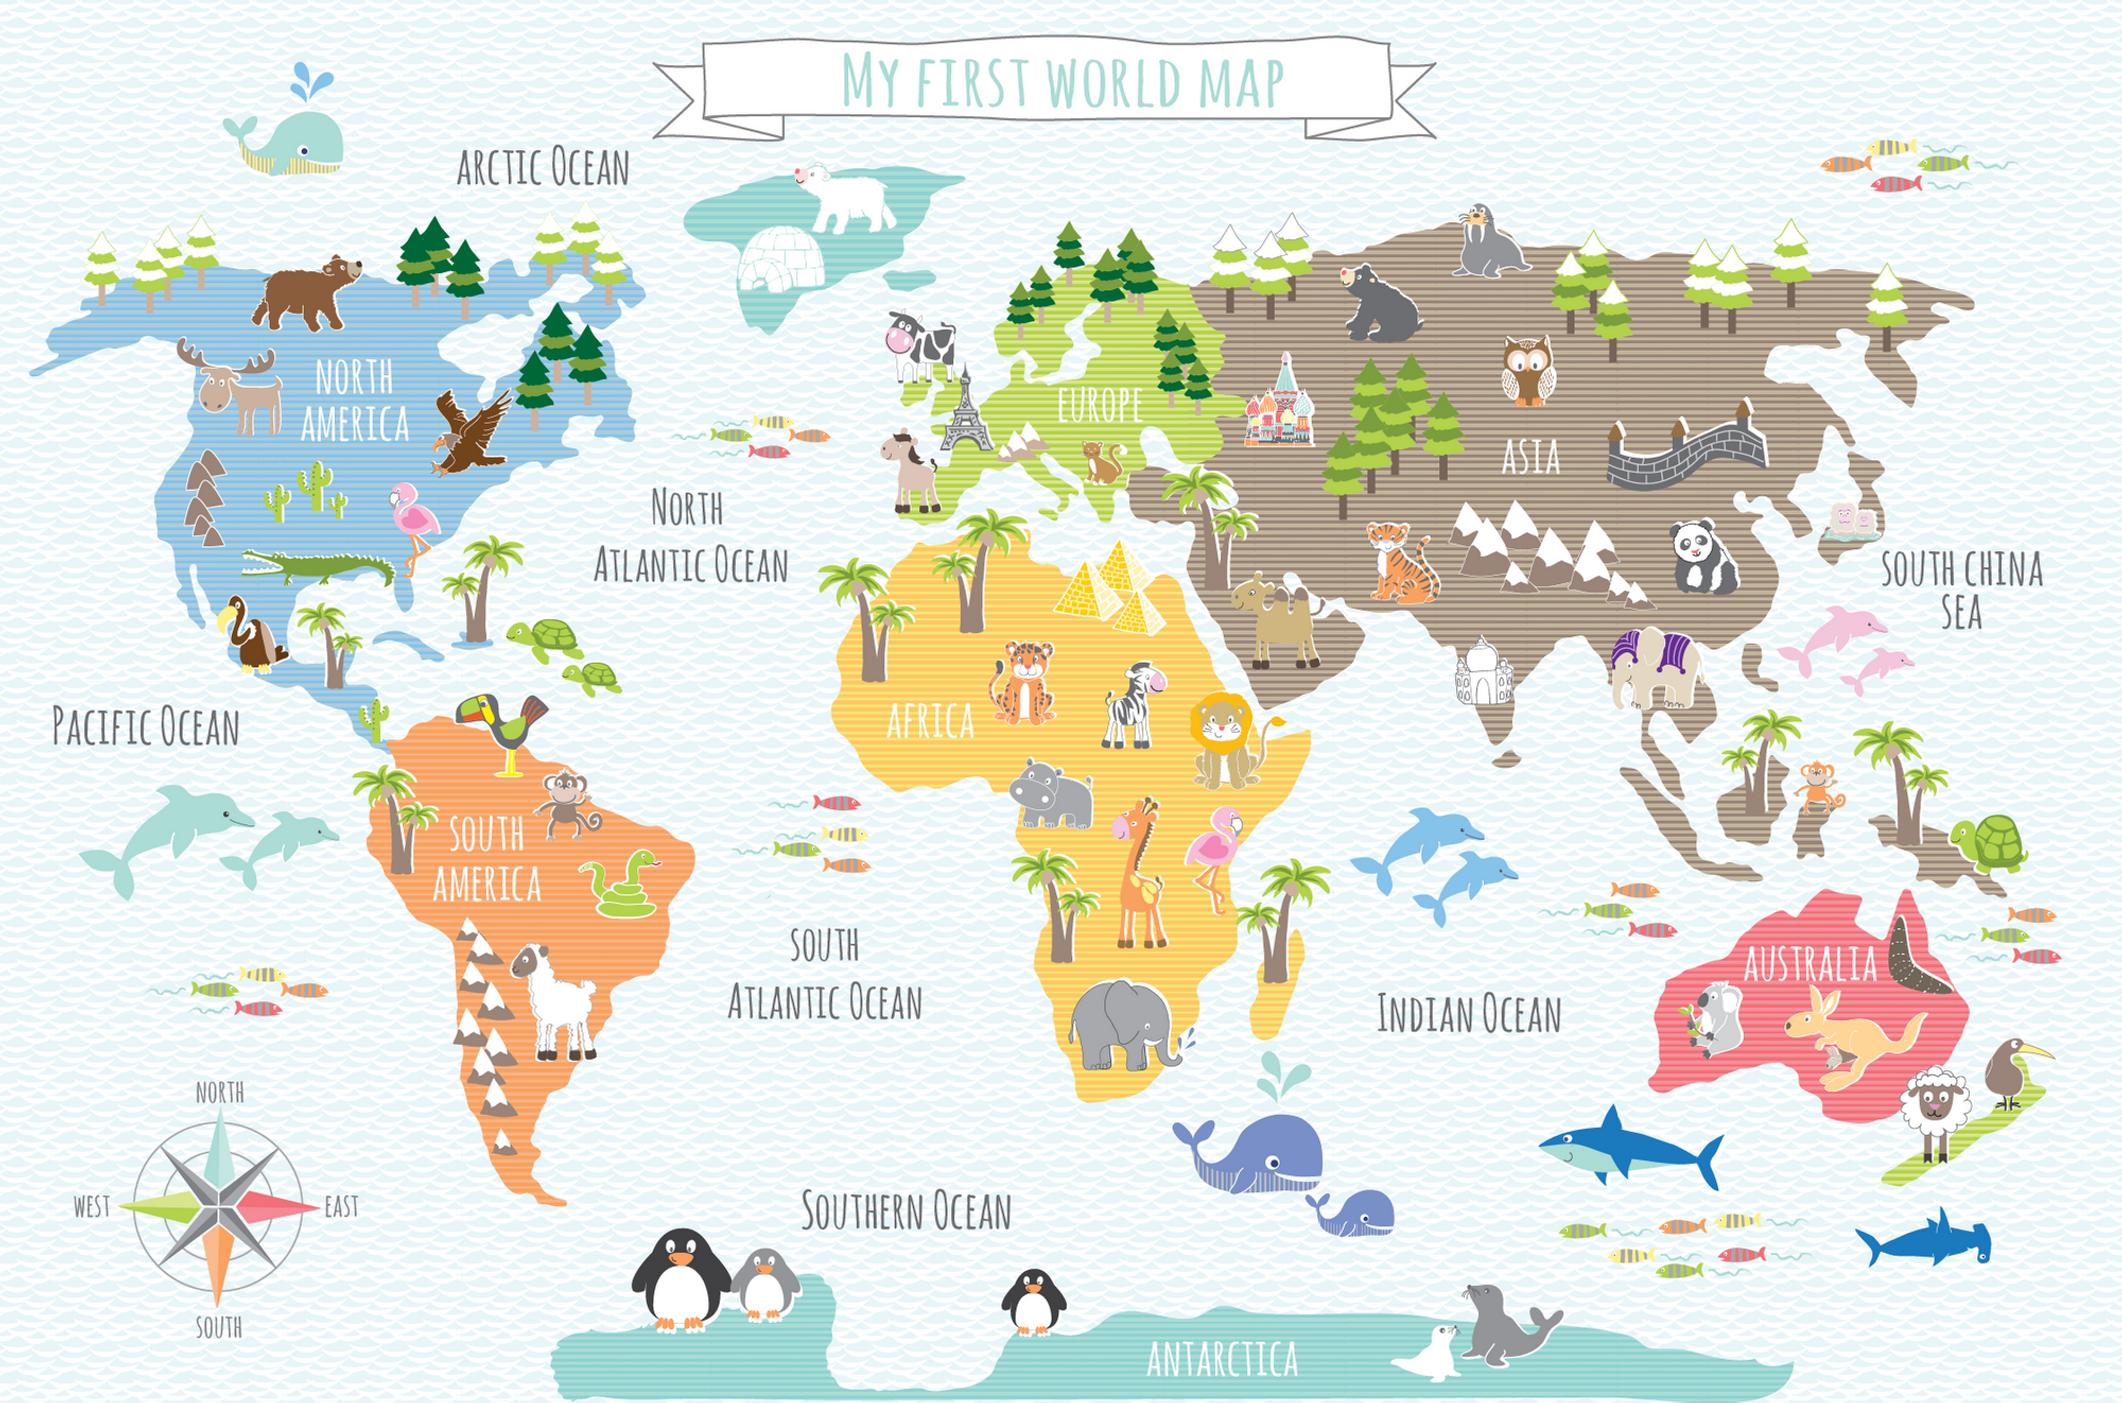 My First World Map Print 50 x 70cm